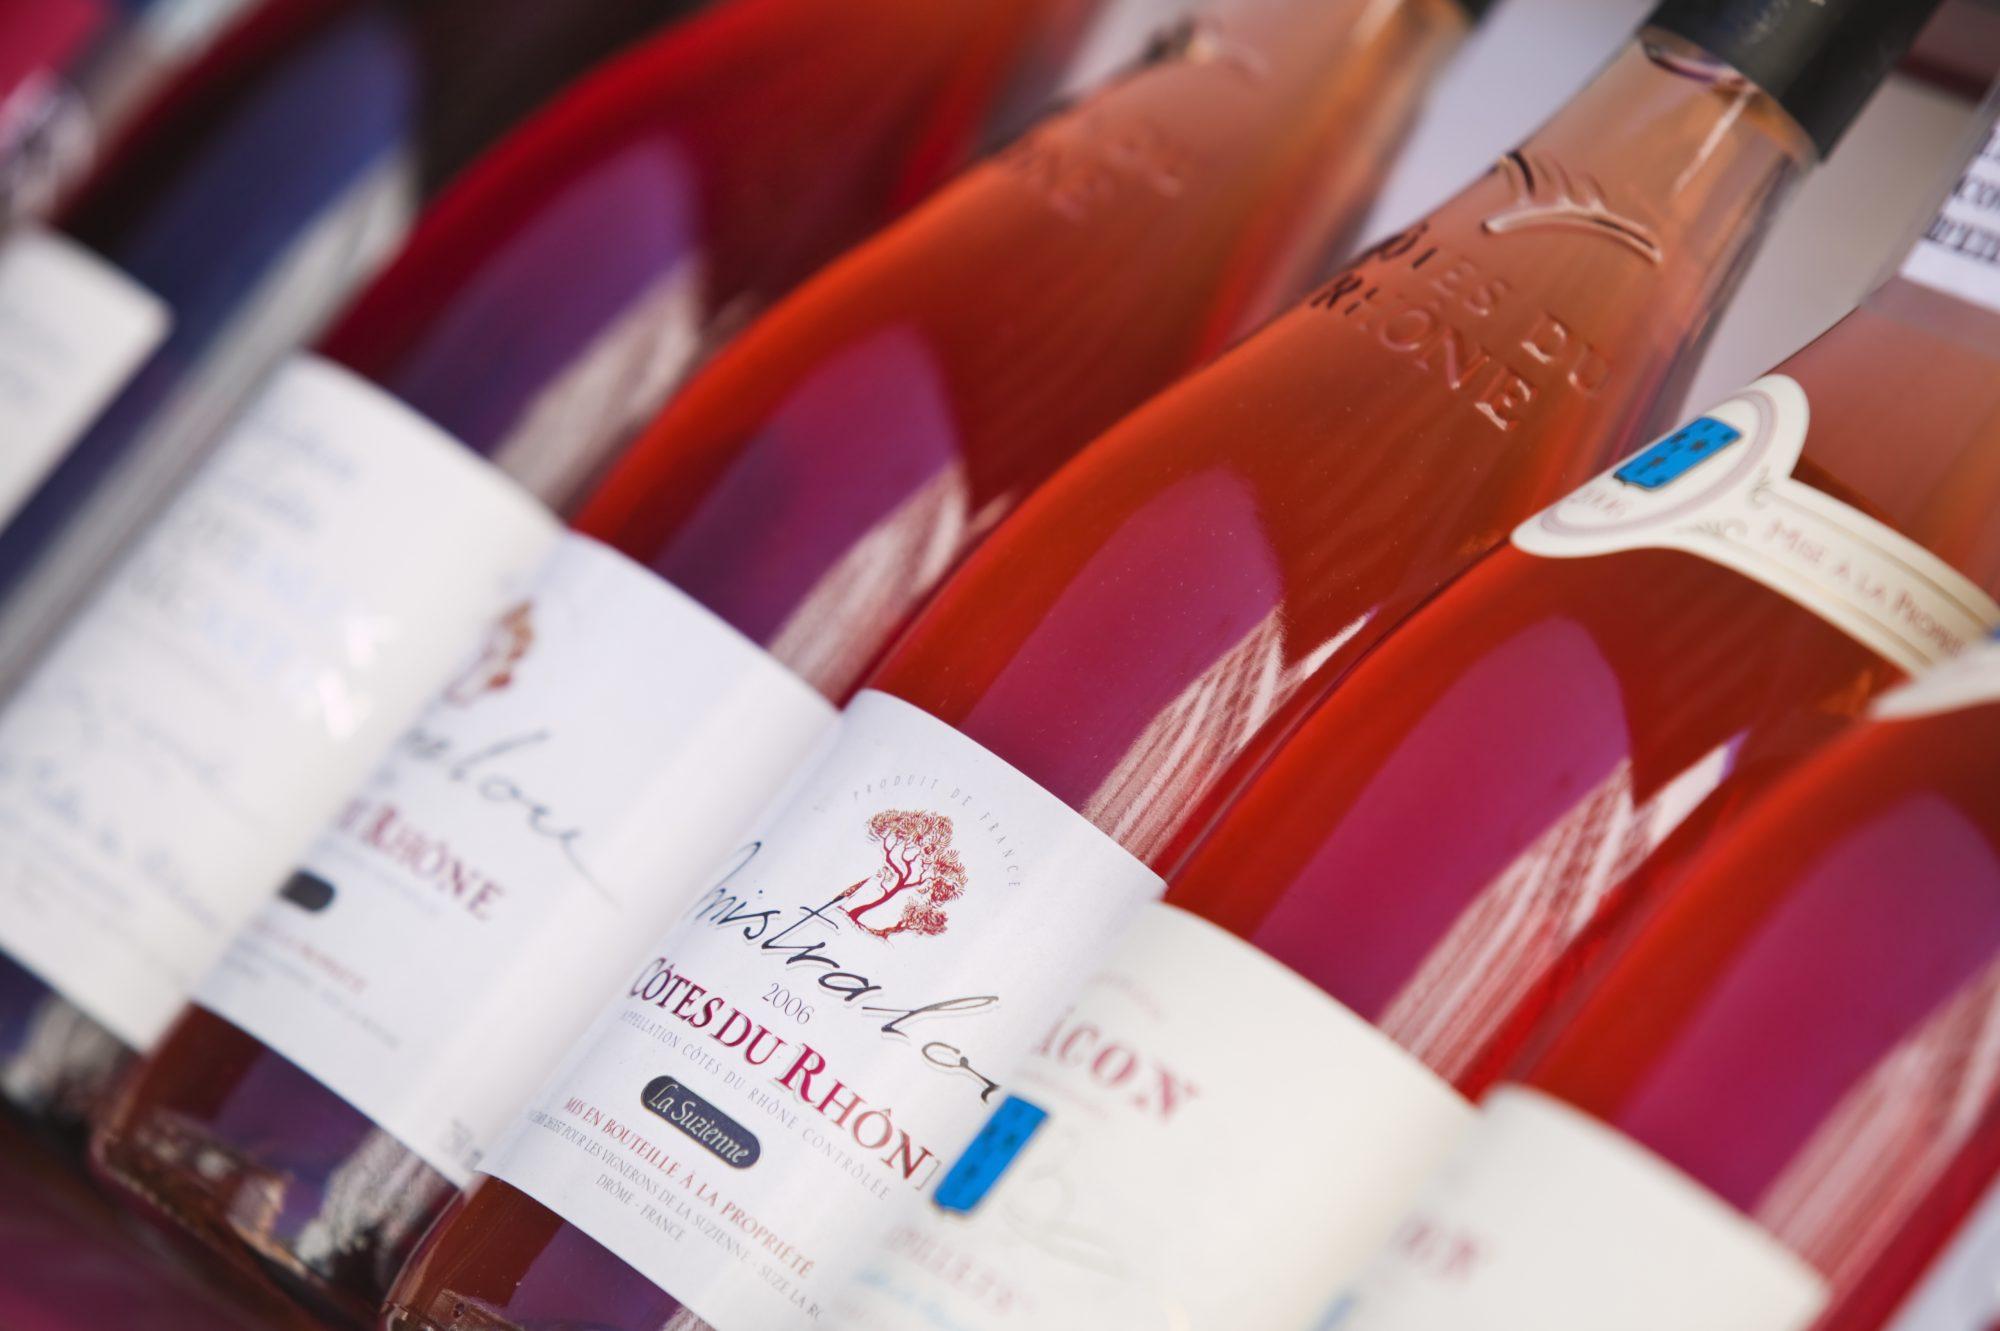 getty-rose-wine-bottle-image